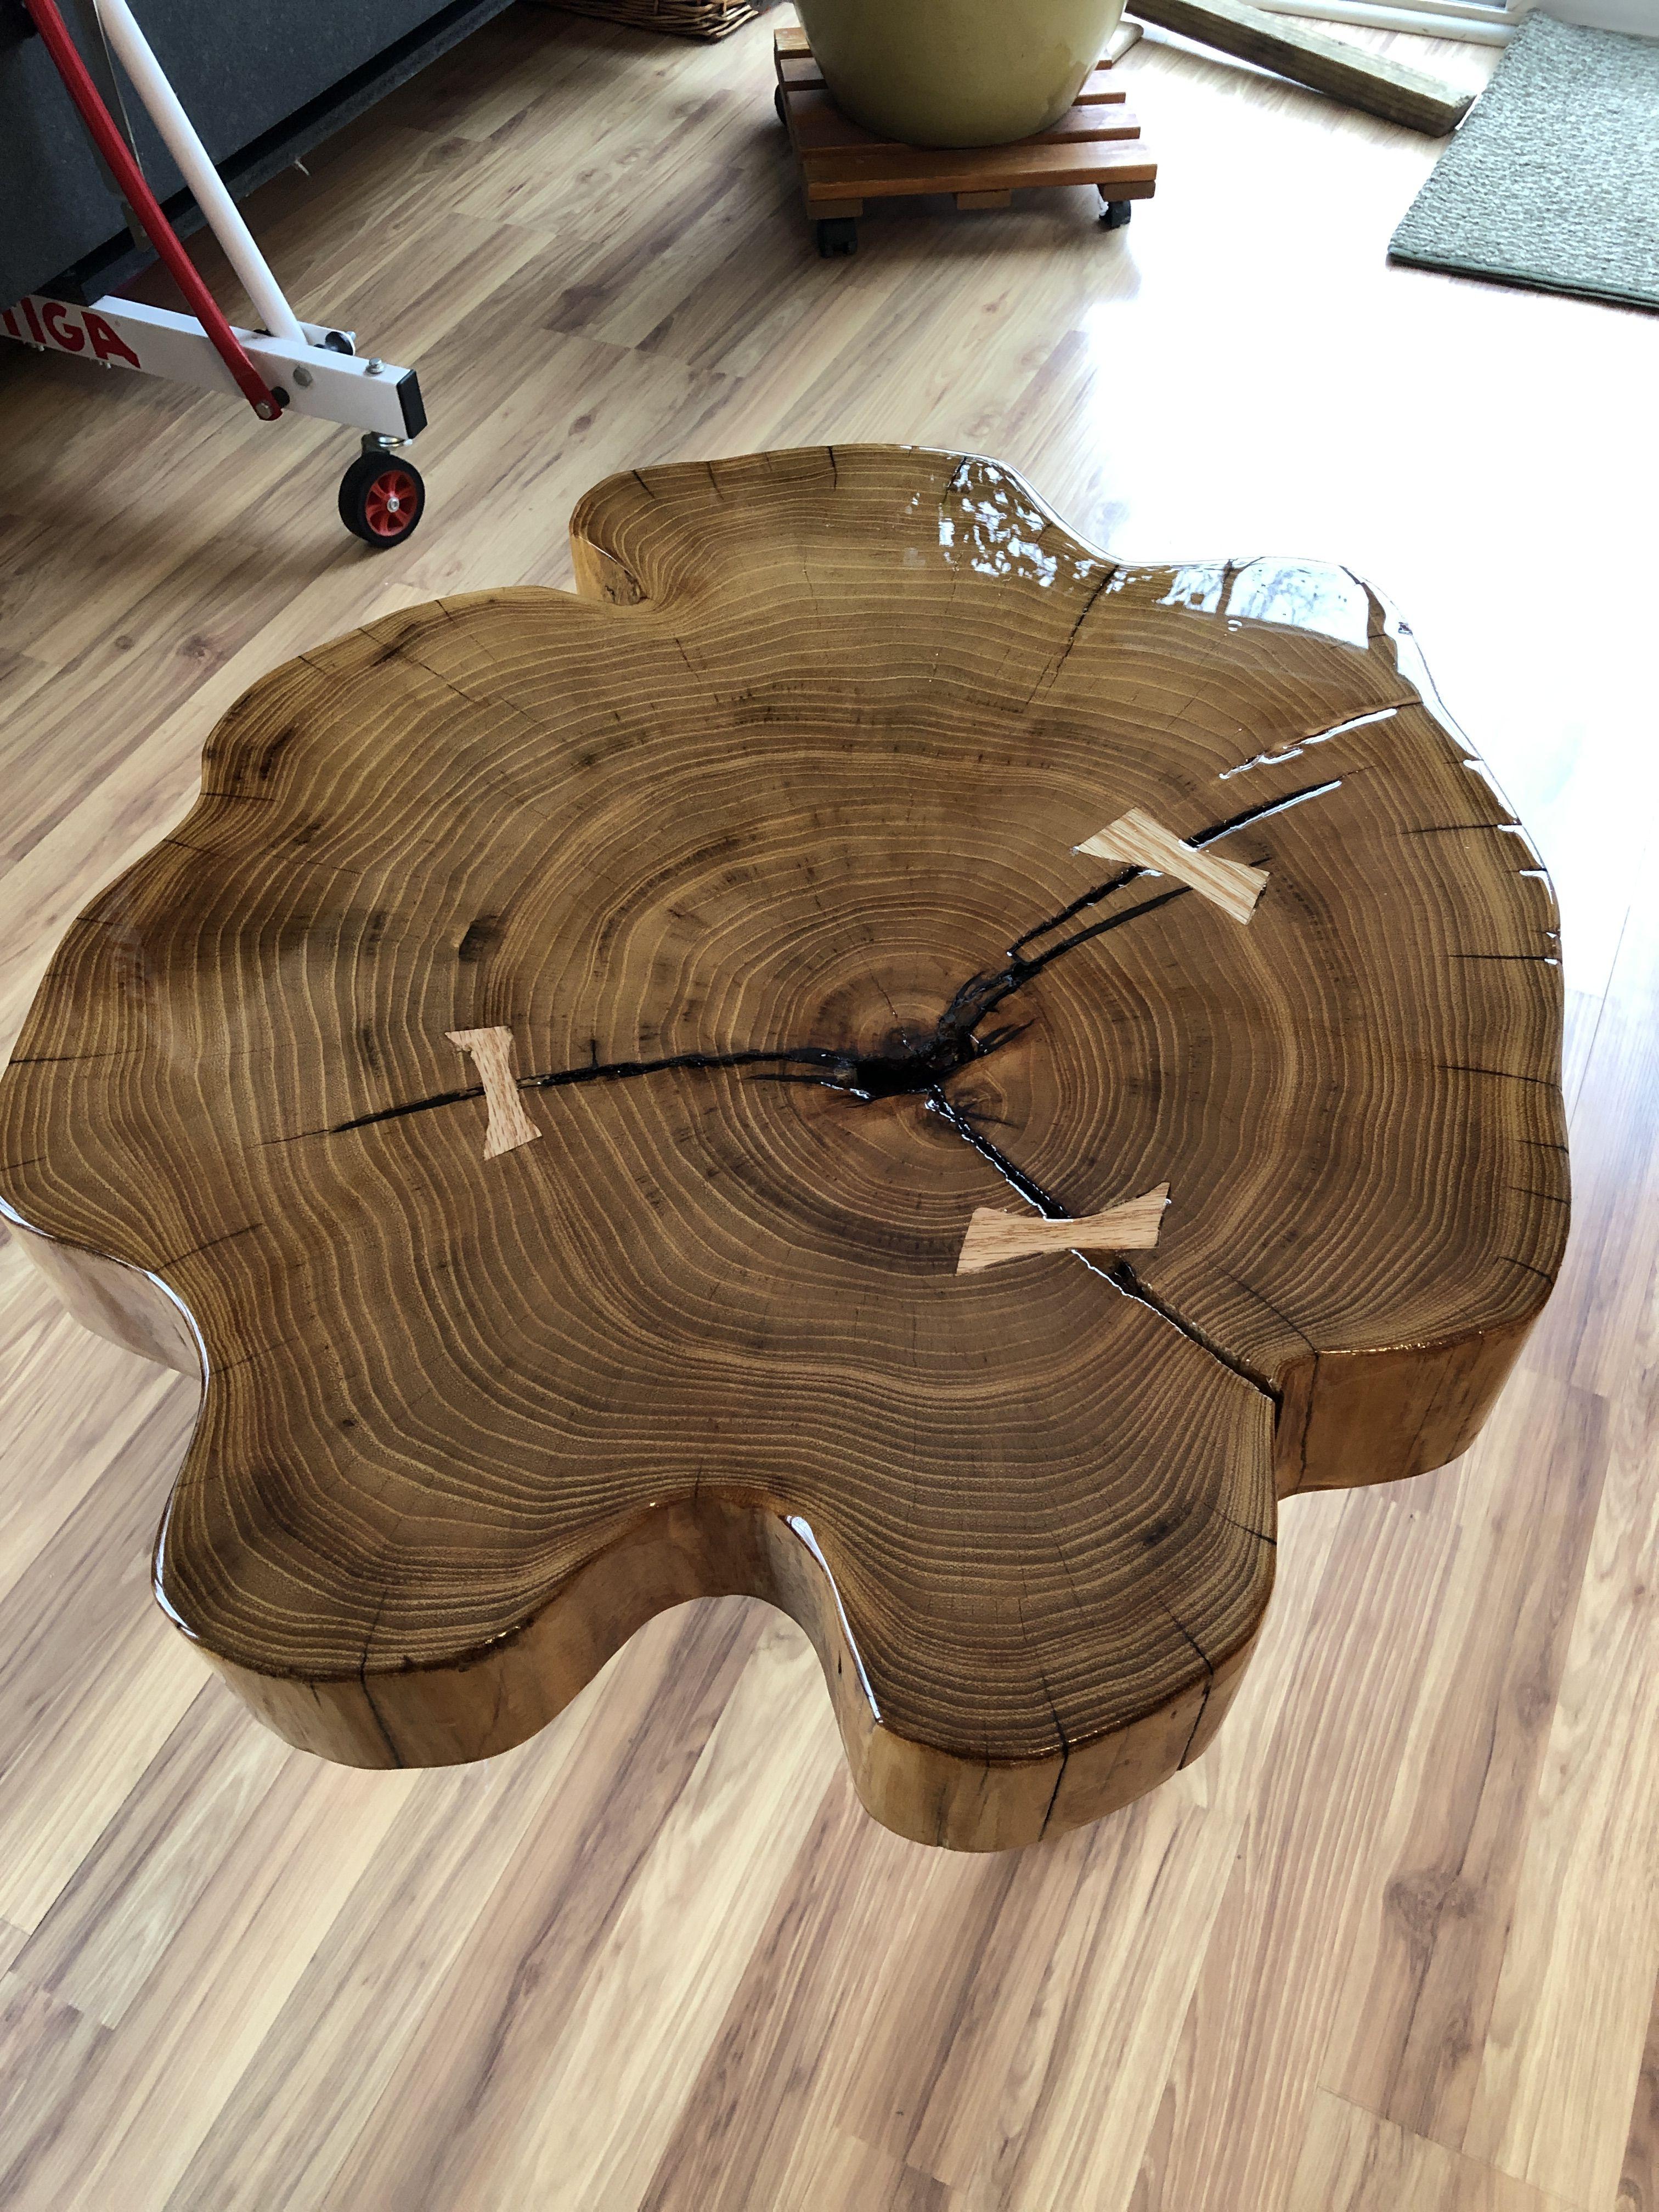 Honey Locust End Table Wood Creations Honey Locust Log Slab